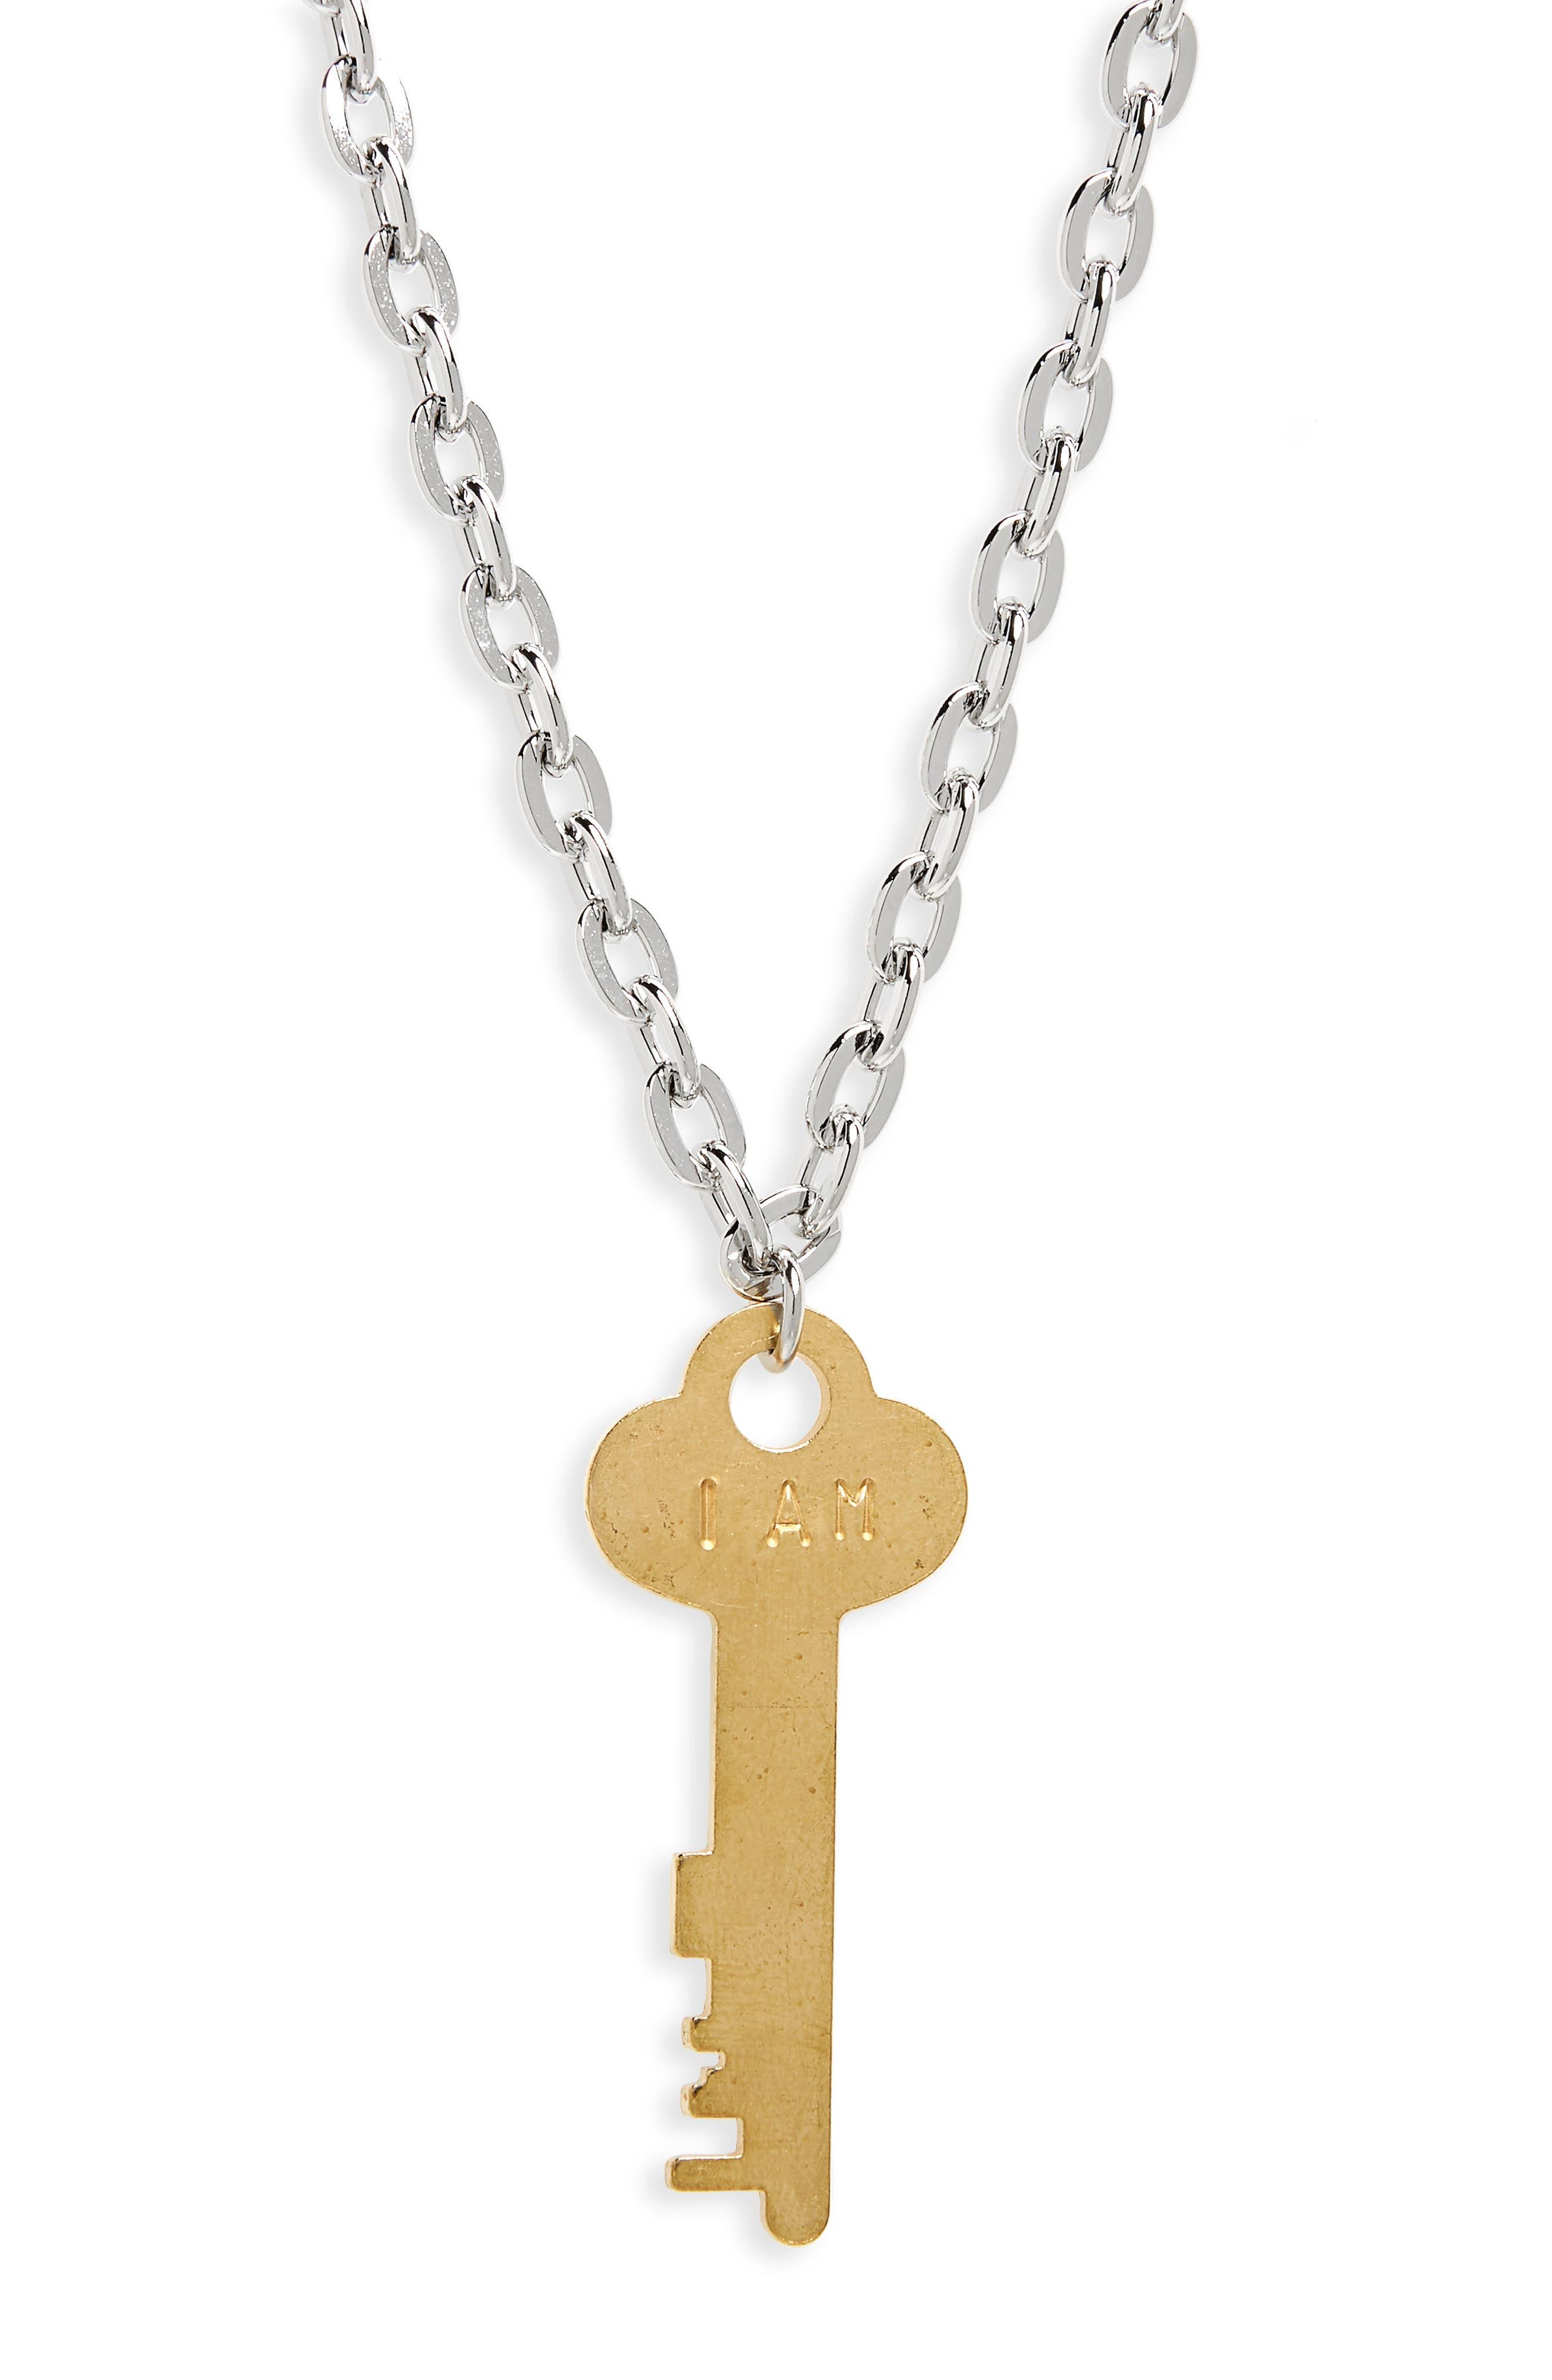 I Am Enough Key Charm Necklace,                             Alternate thumbnail 2, color,                             Silver/ Gold Key